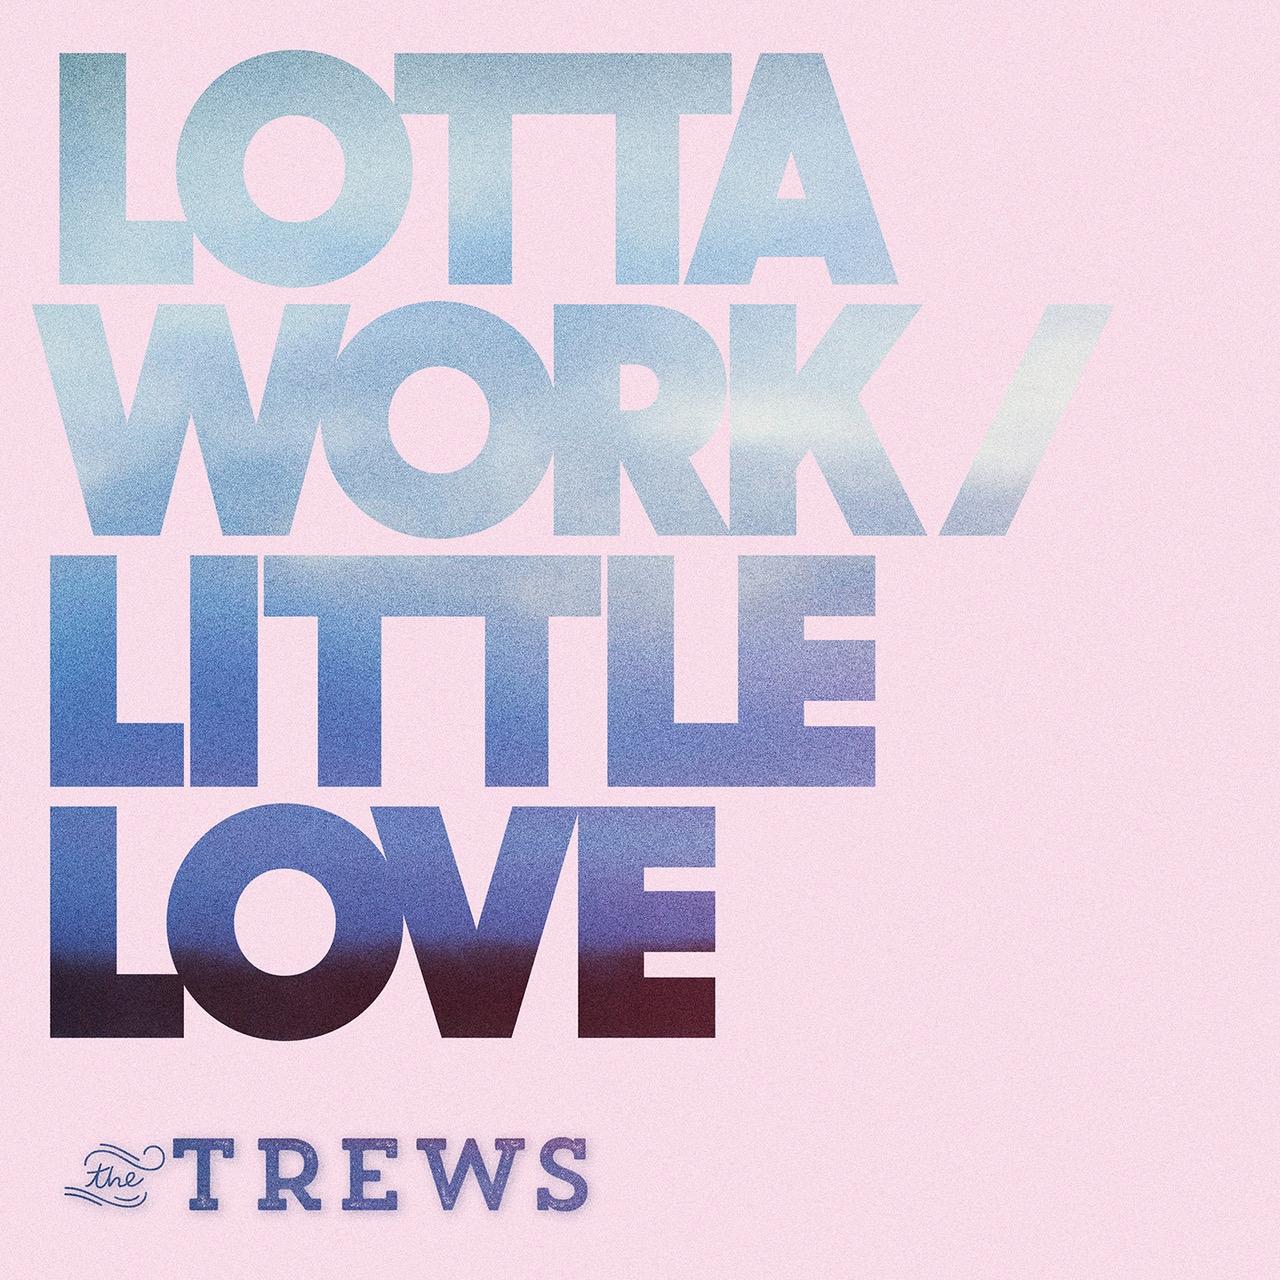 The Trews - Lotta Work/Little Love